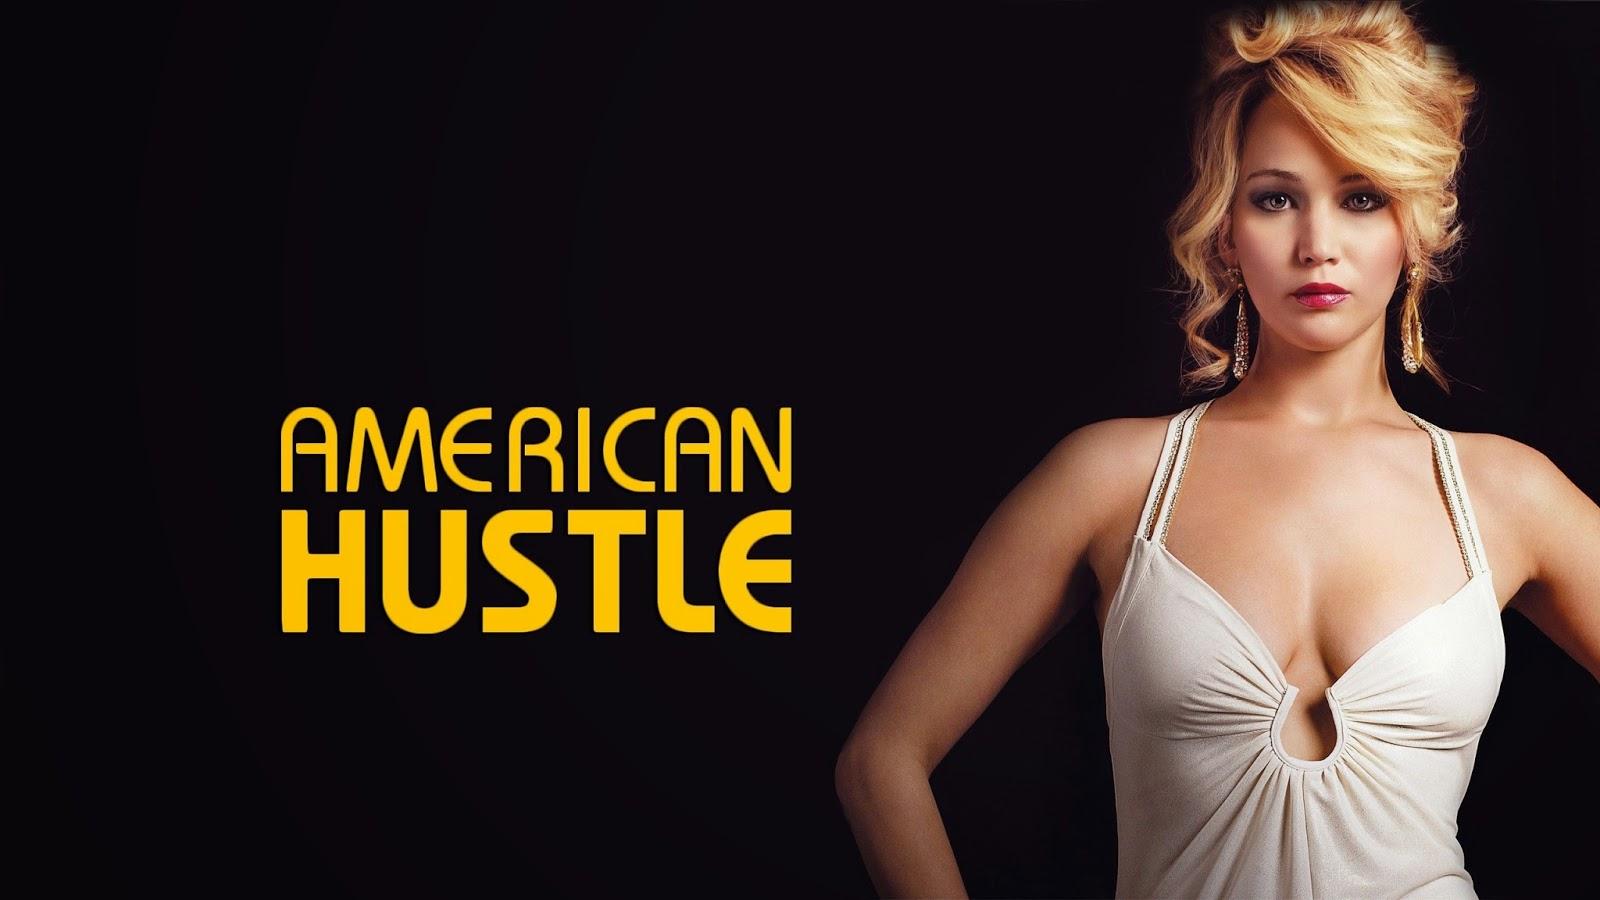 Jennifer Lawrence American Actress Hot And Sexy Hd